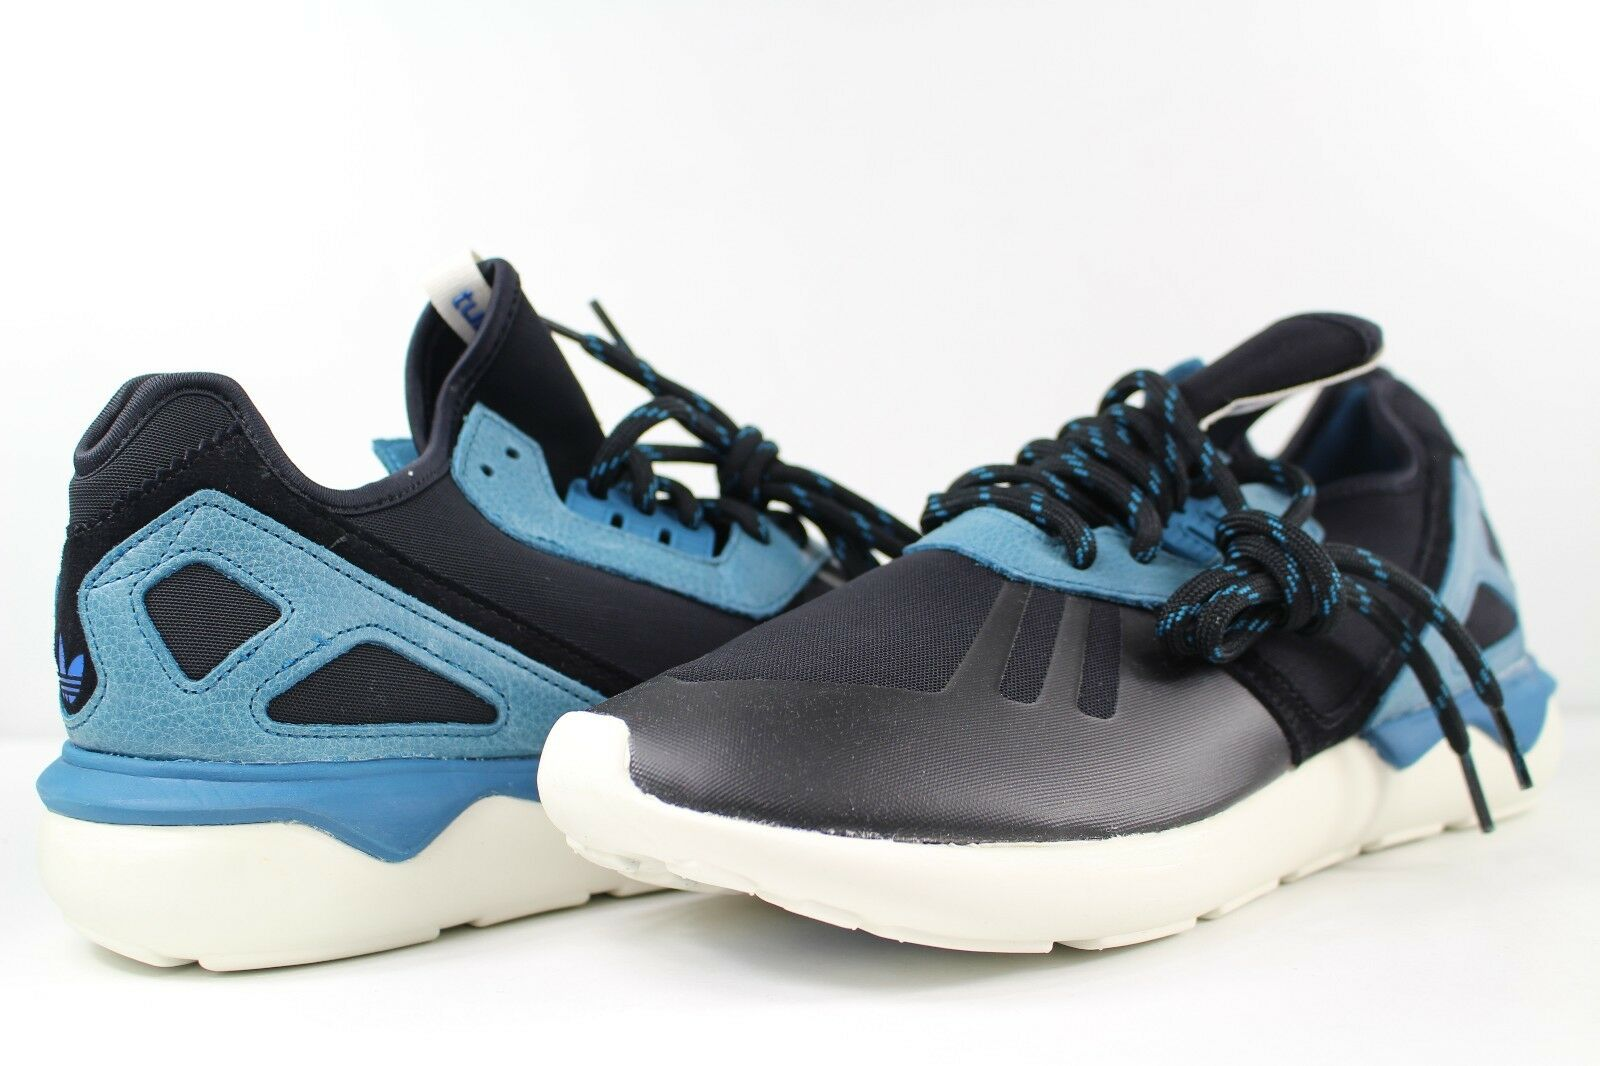 Adidas Surf Tubular Runner Core Black Surf Adidas Petrol Blue White Size 10.5 360ca7